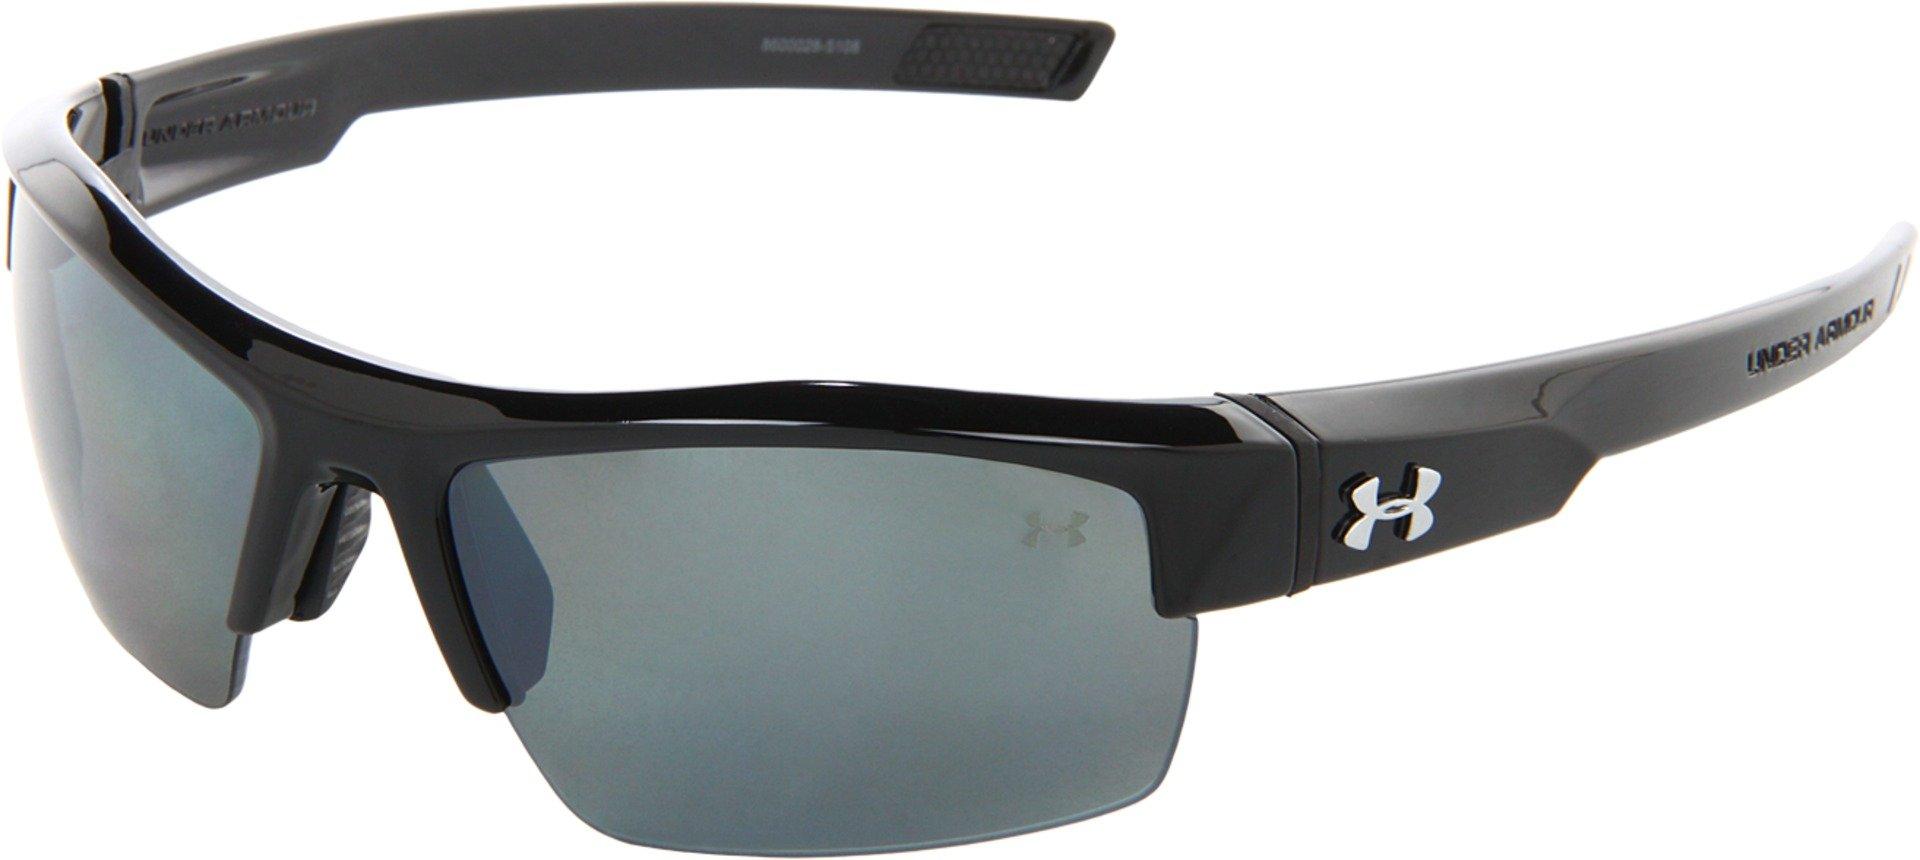 85380e0b0cf0 Under Armour Igniter Polarized Sunglasse UV Protection Polycarbonate Lens  Black